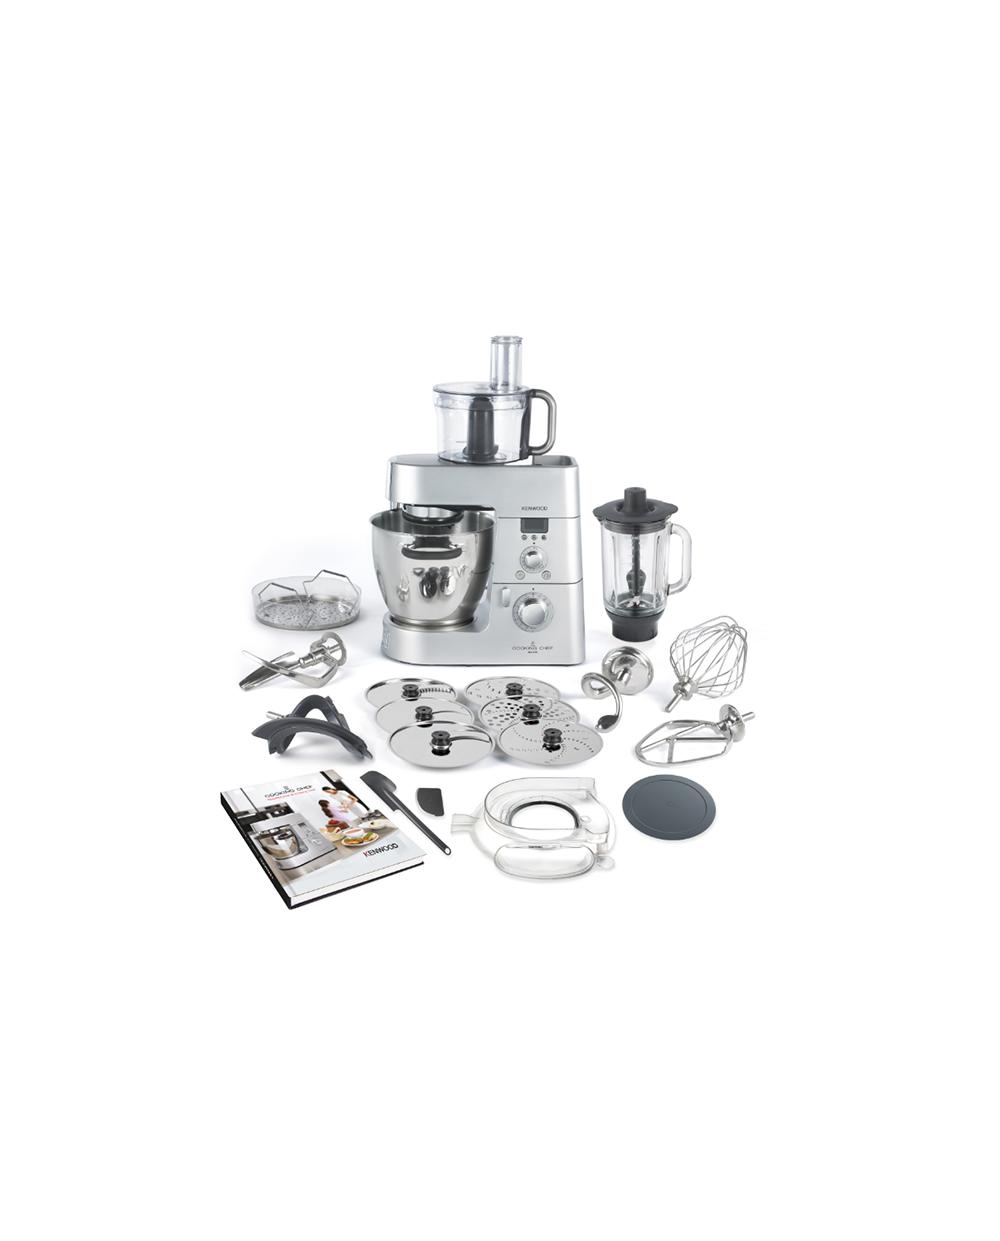 Robot cuiseur kenwood cooking chef major km099premium for Robot kenwood cooking chef major